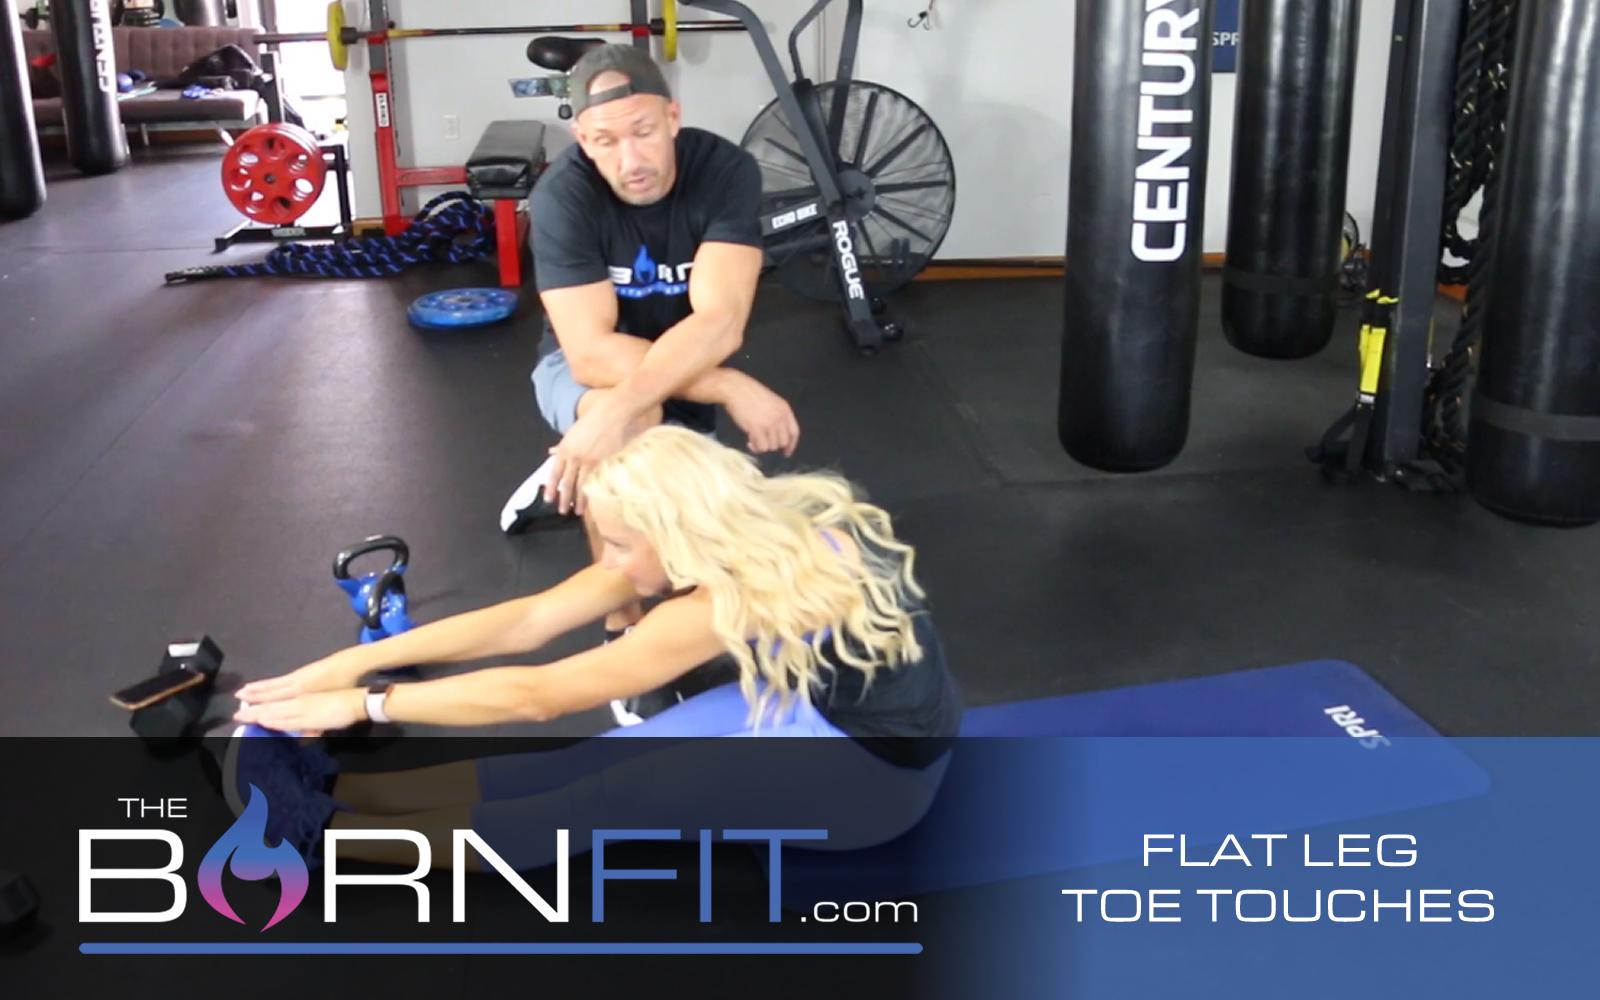 Flat leg toe touches workout